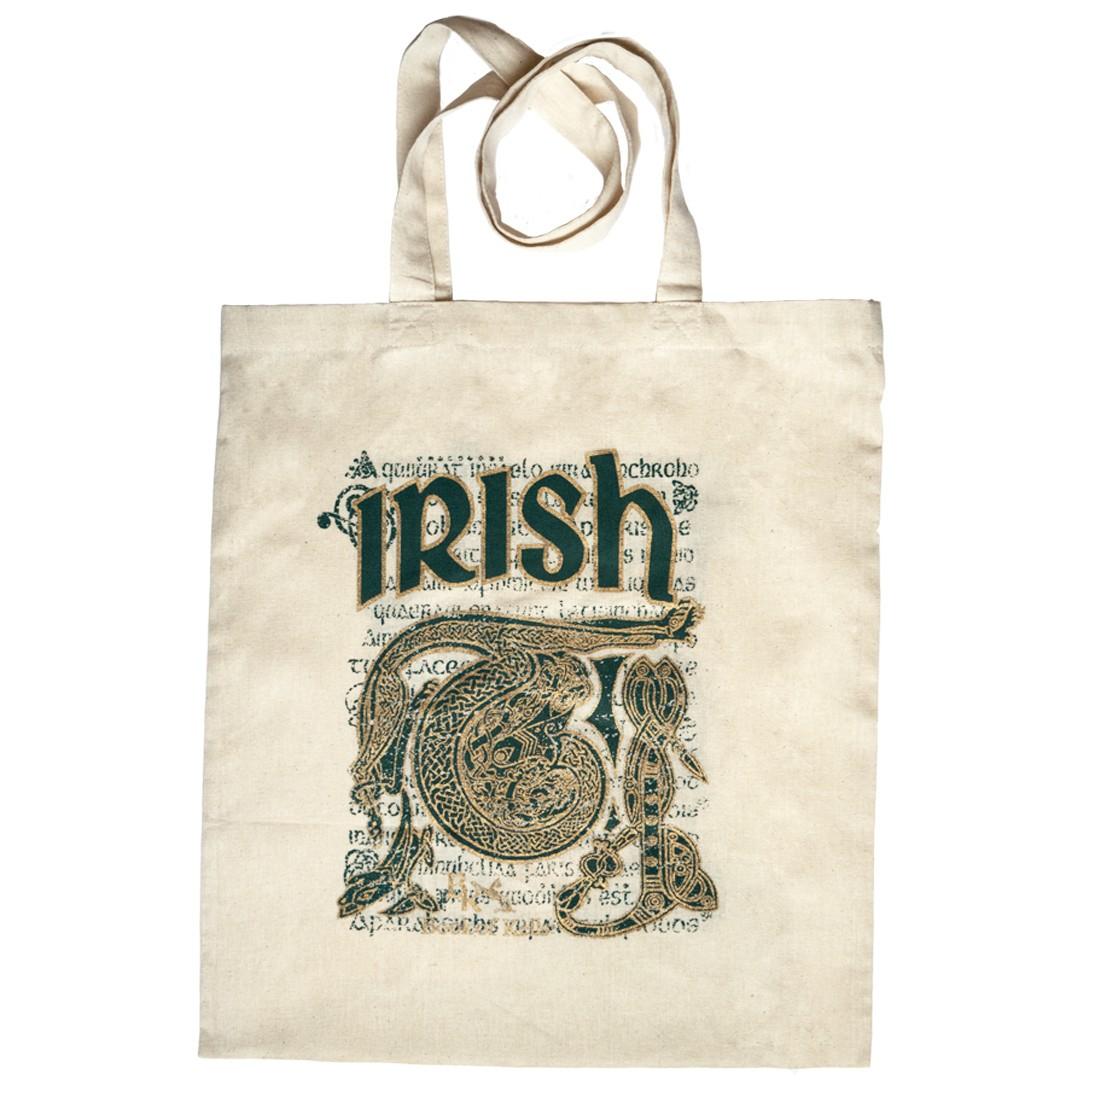 BOOK OF KELLS IRISH SCRIPT Amp CELTIC DESIGN TOTE BAG